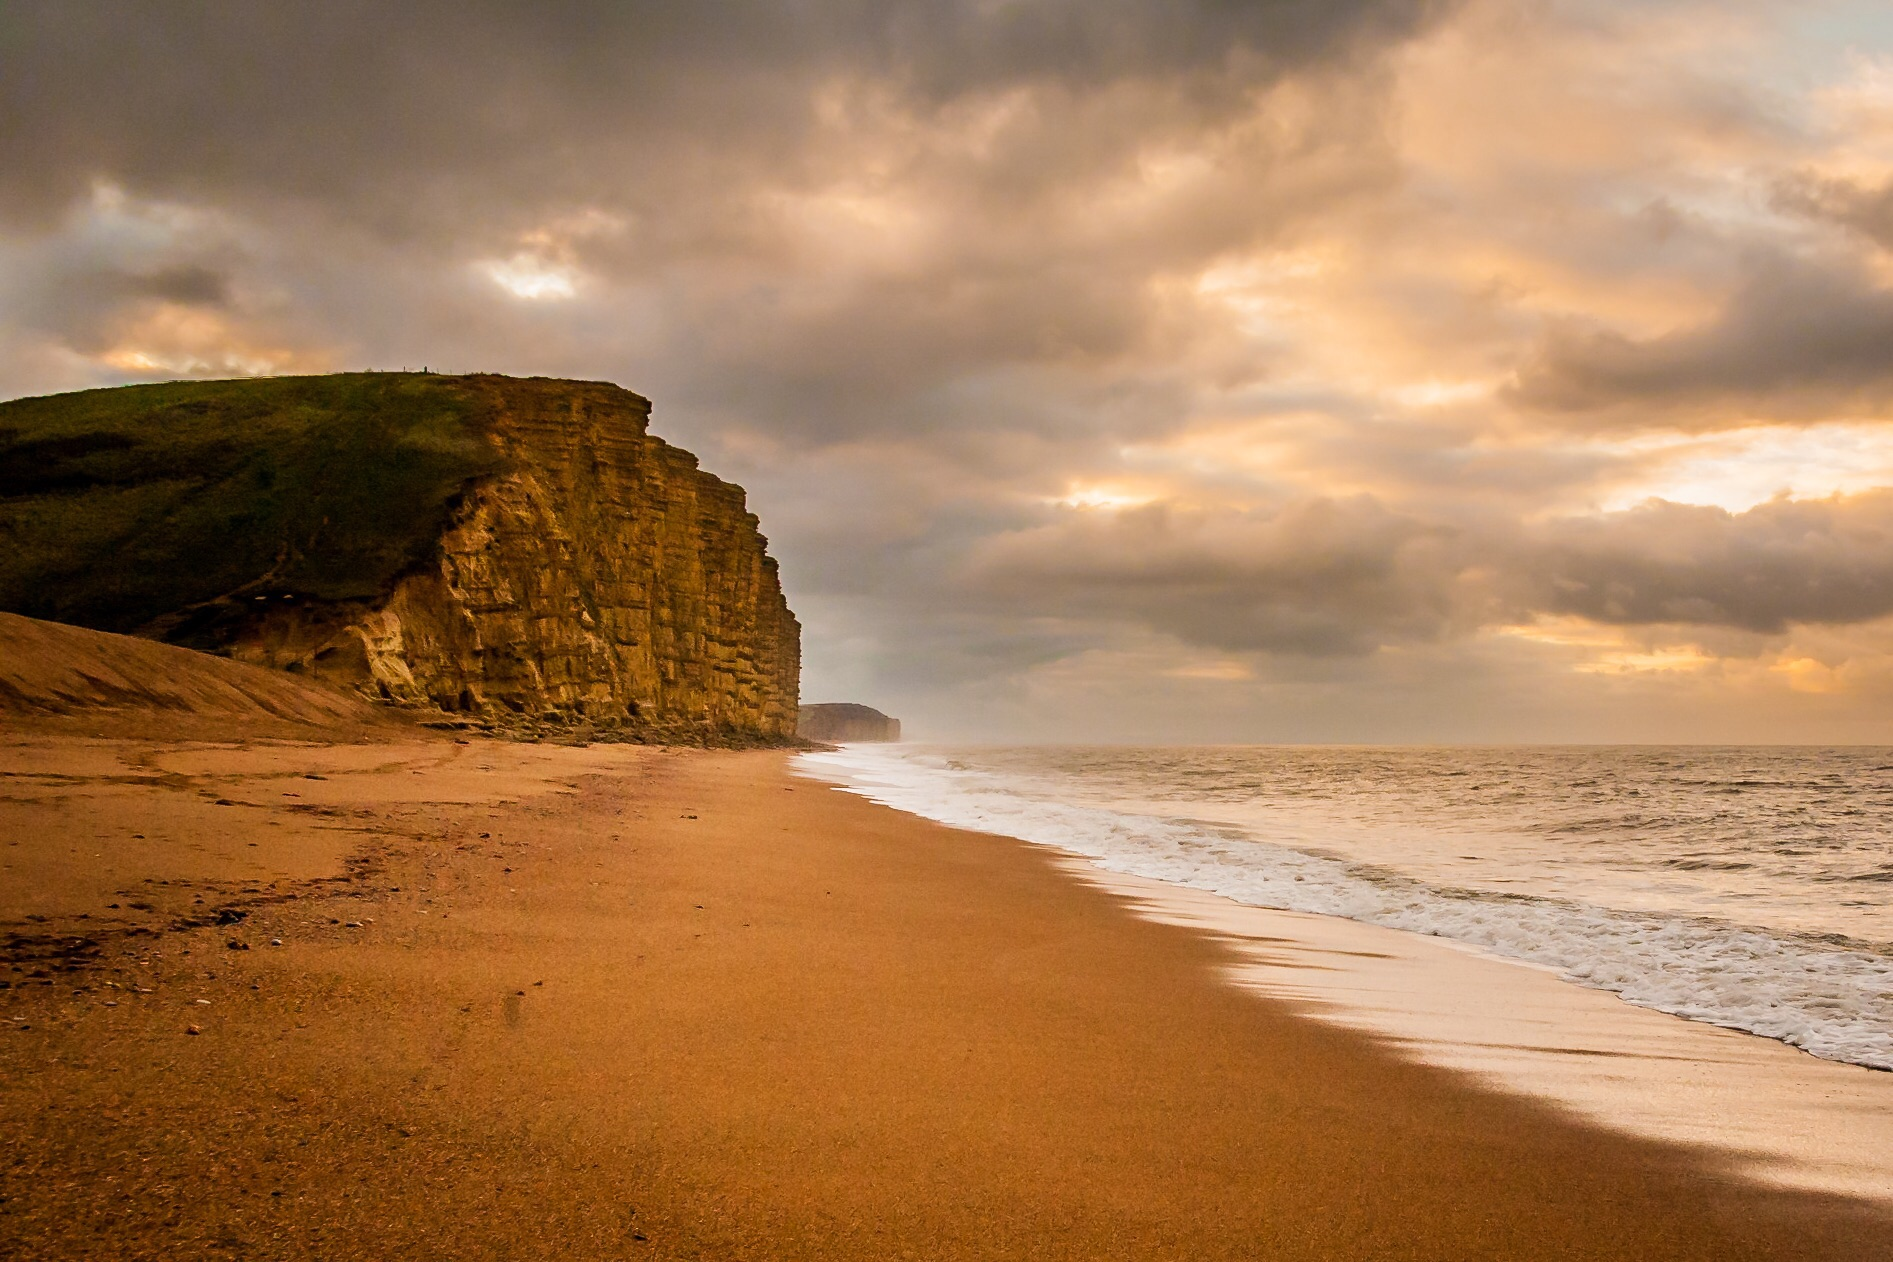 West Bay, Dorset, by Dorset Photographer Rick McEvoy